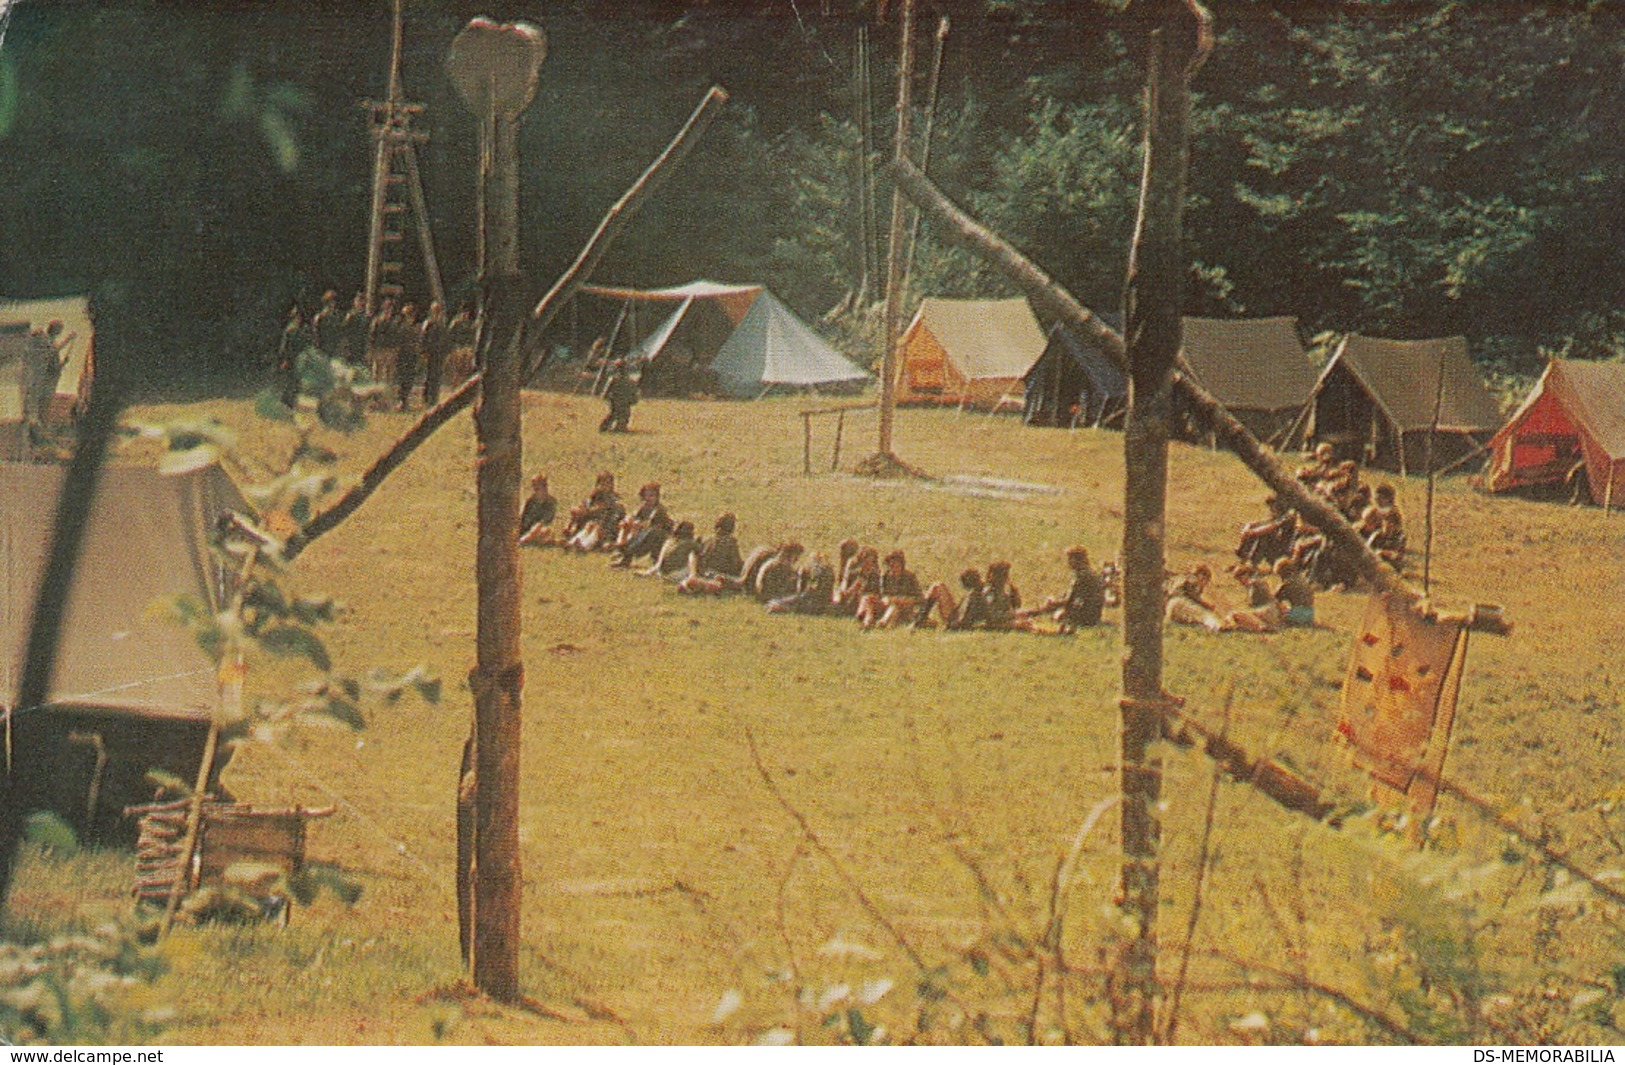 BOY SCOUT CAMP SCOUT ASSOCIATION RIJEKA CROATIA - Scoutisme